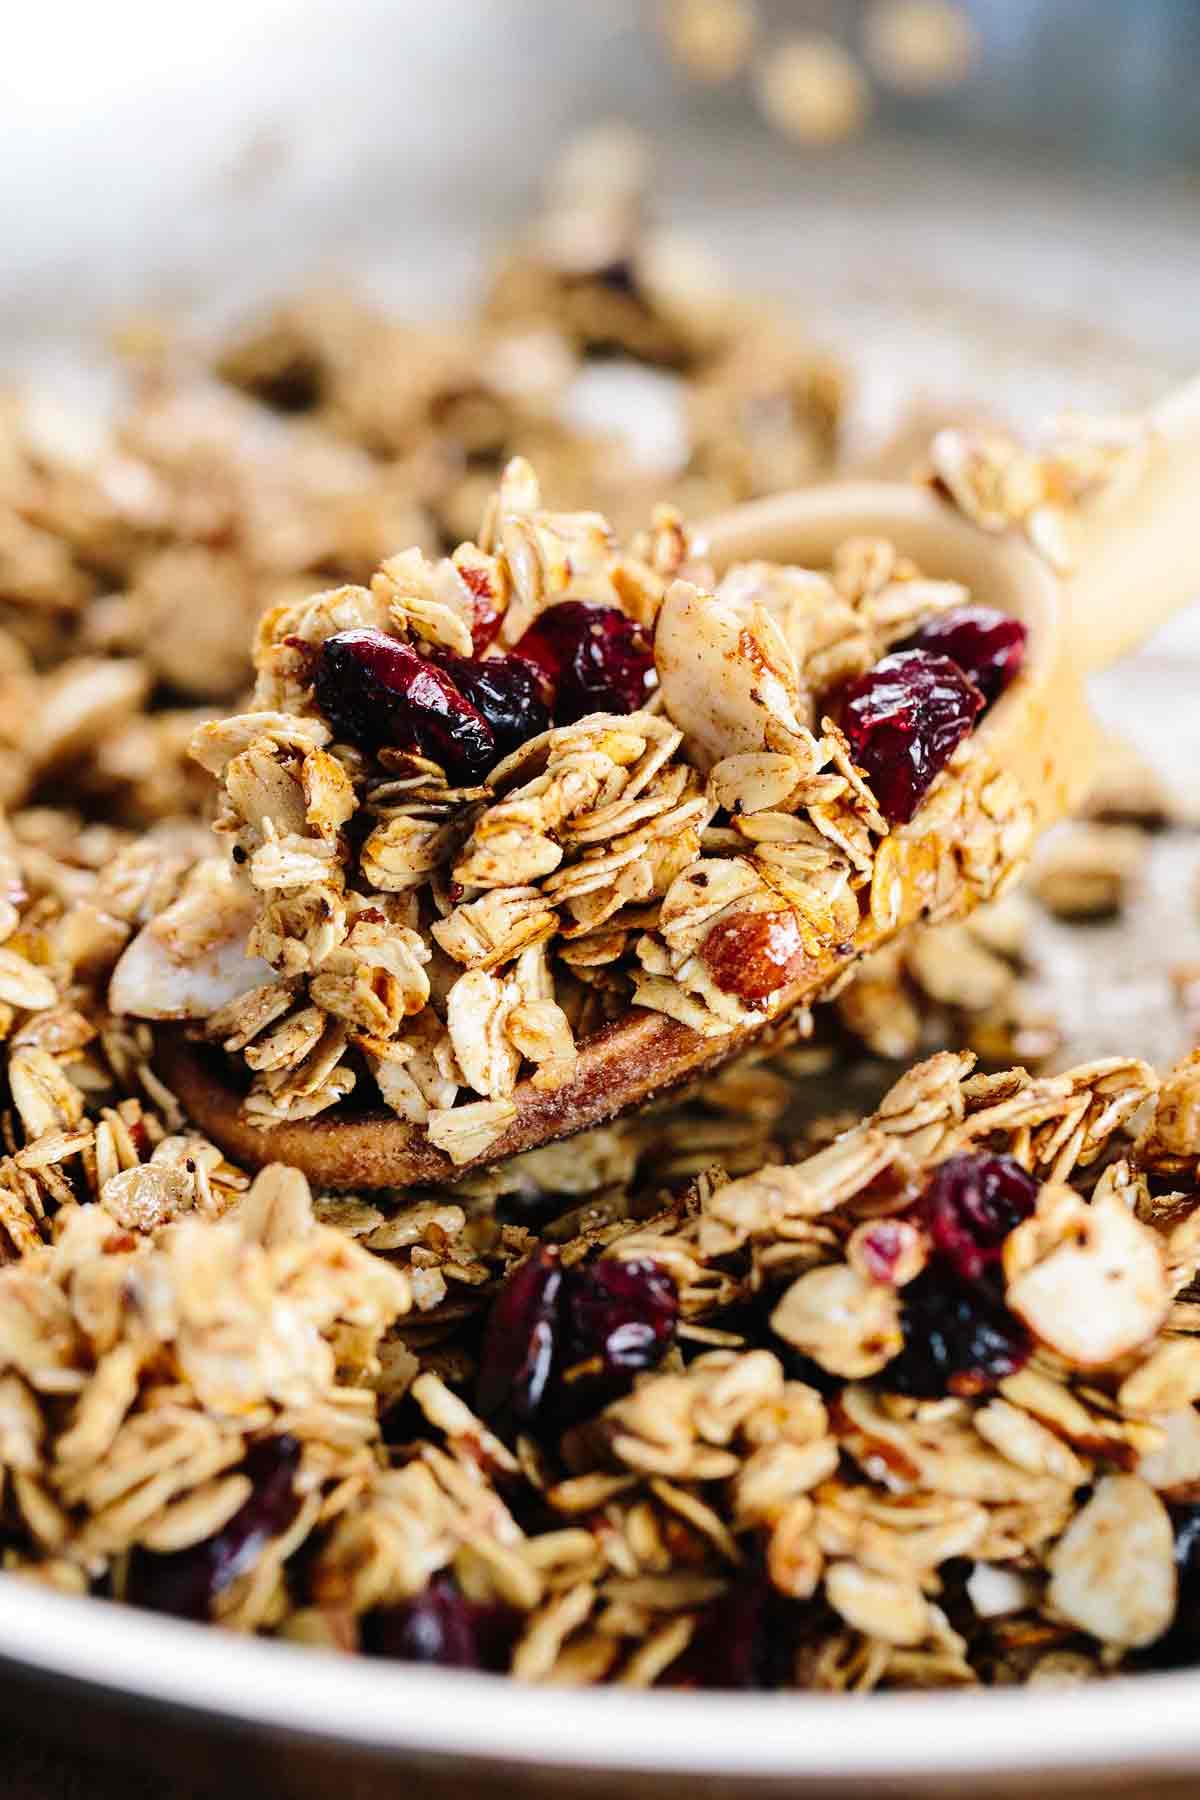 Wooden spoon scooping granola